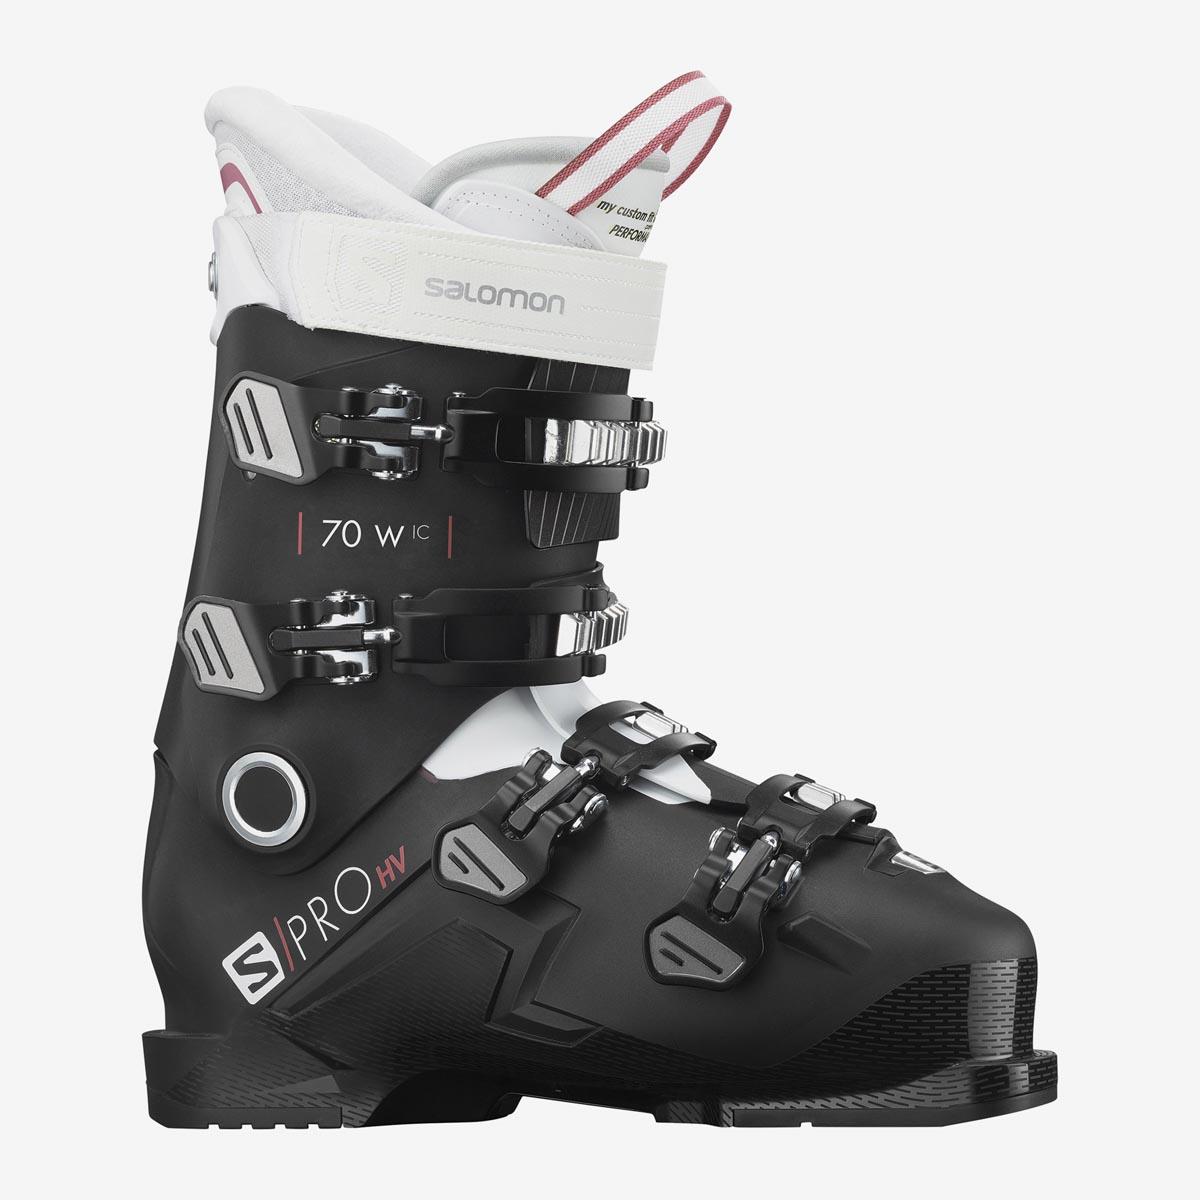 Ботинки лыжные S/PRO HV 70 W IC